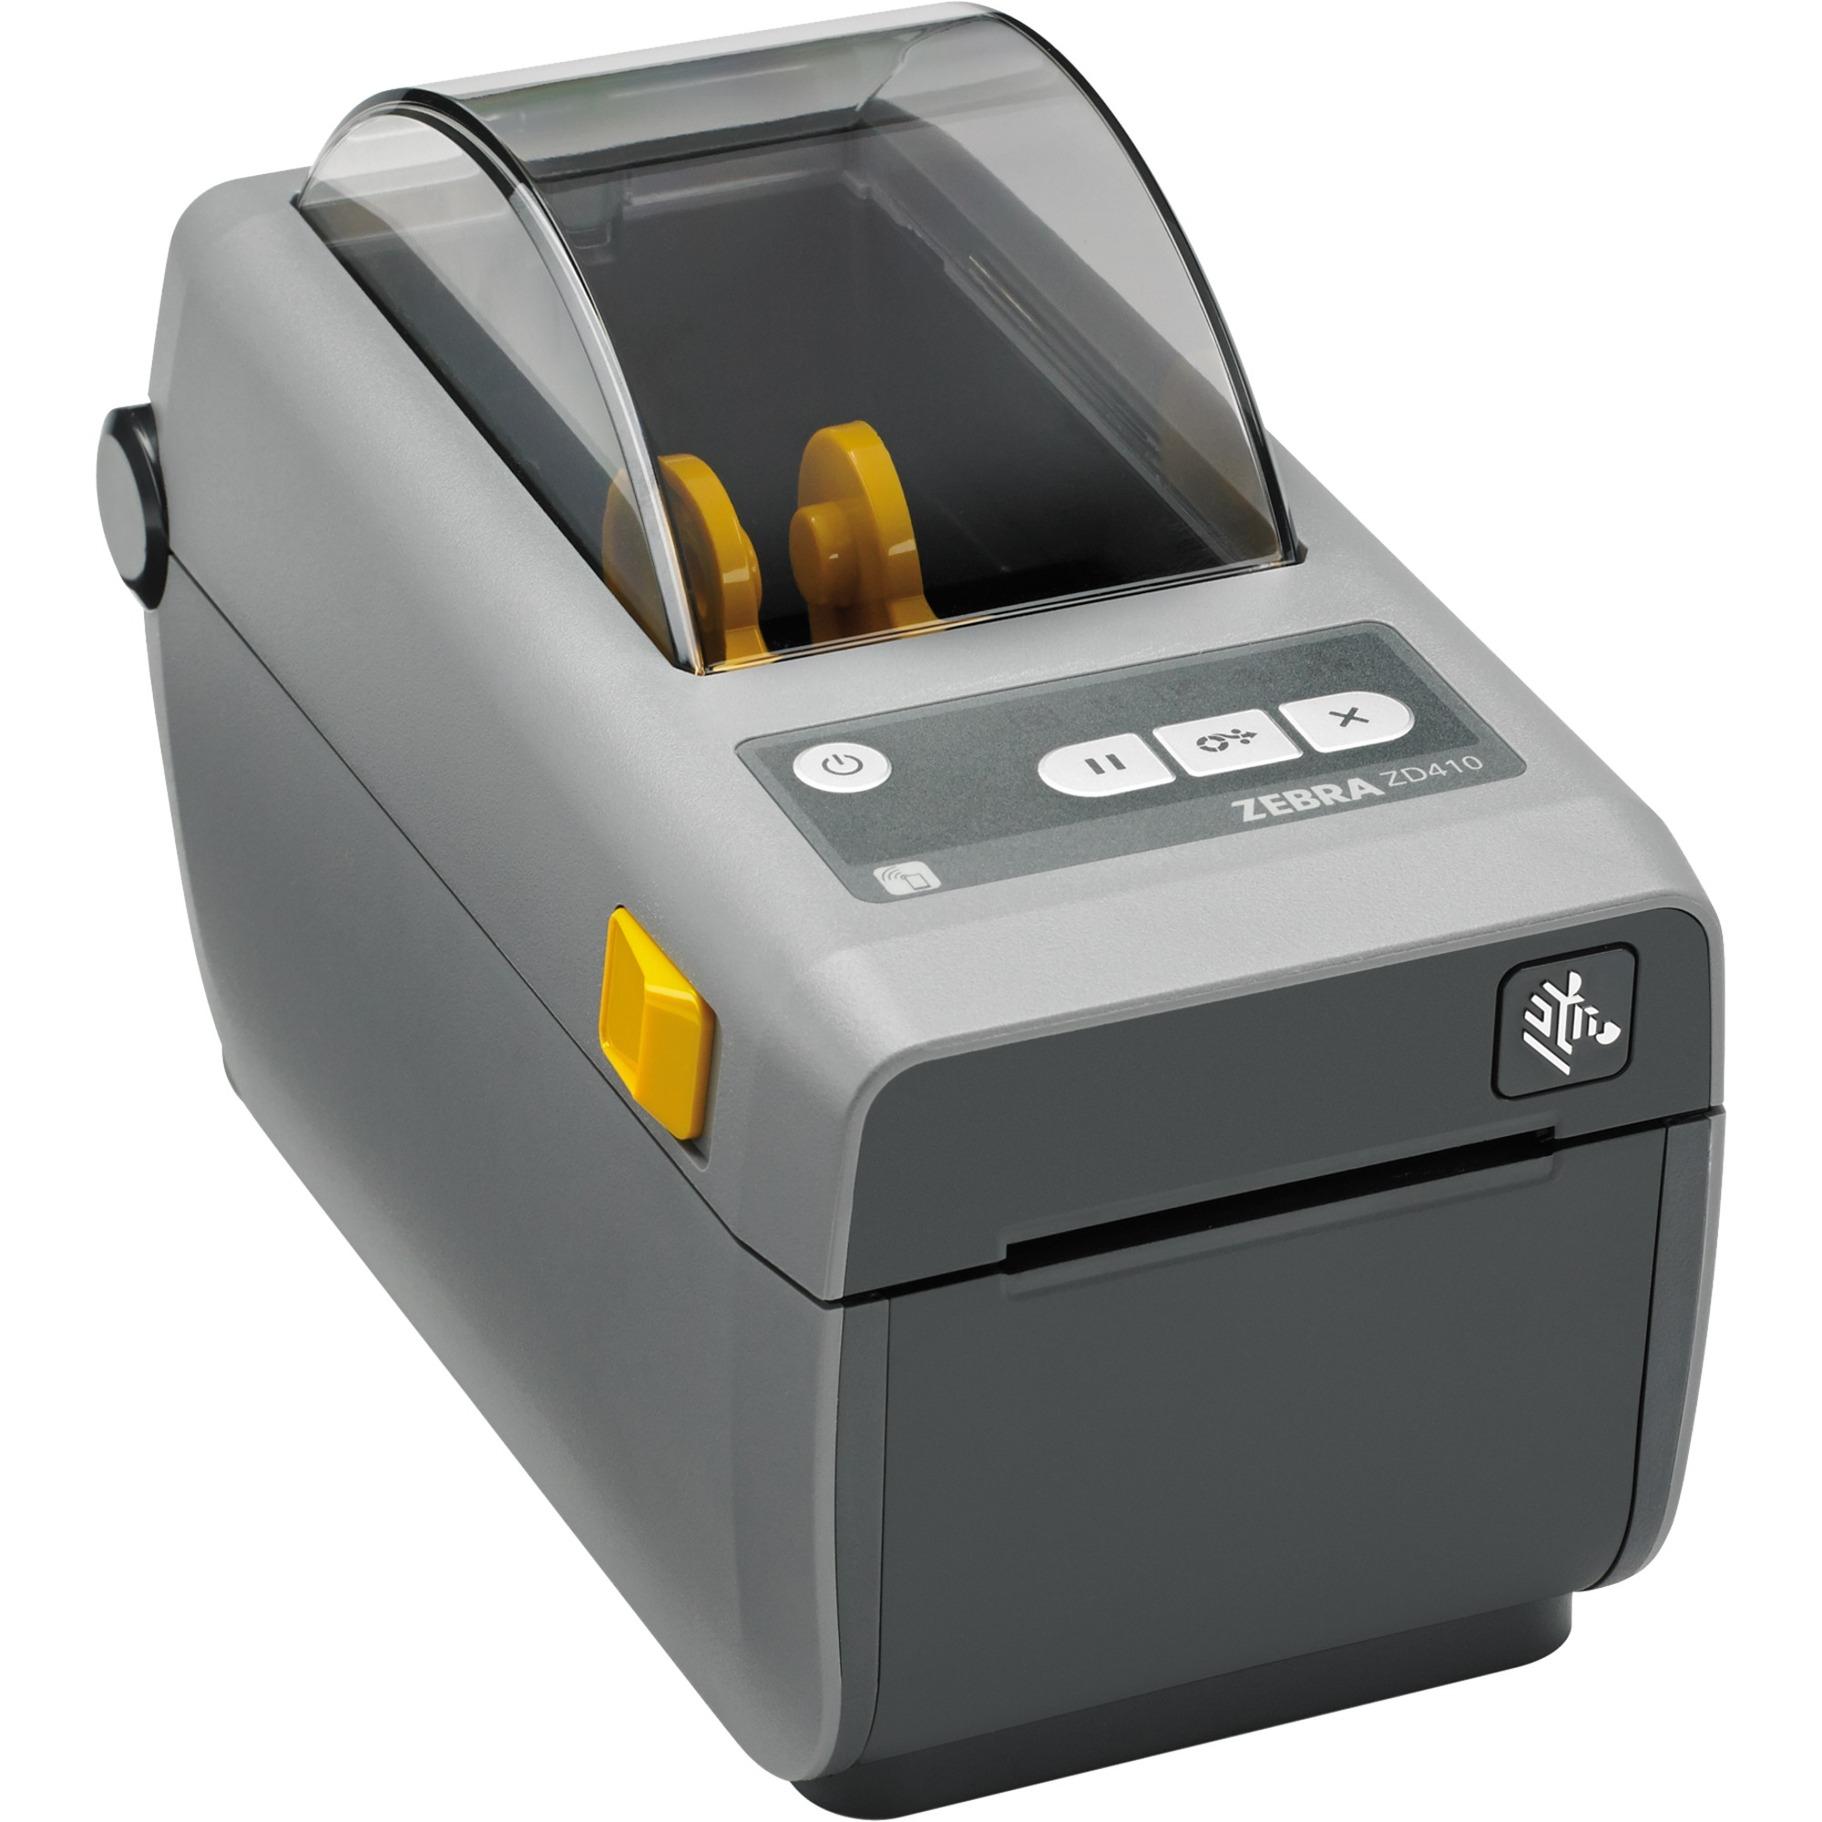 ZD410 impresora de etiquetas Térmica directa 203 x 203 DPI Inalámbrico y alámbrico, Impresora de tickets